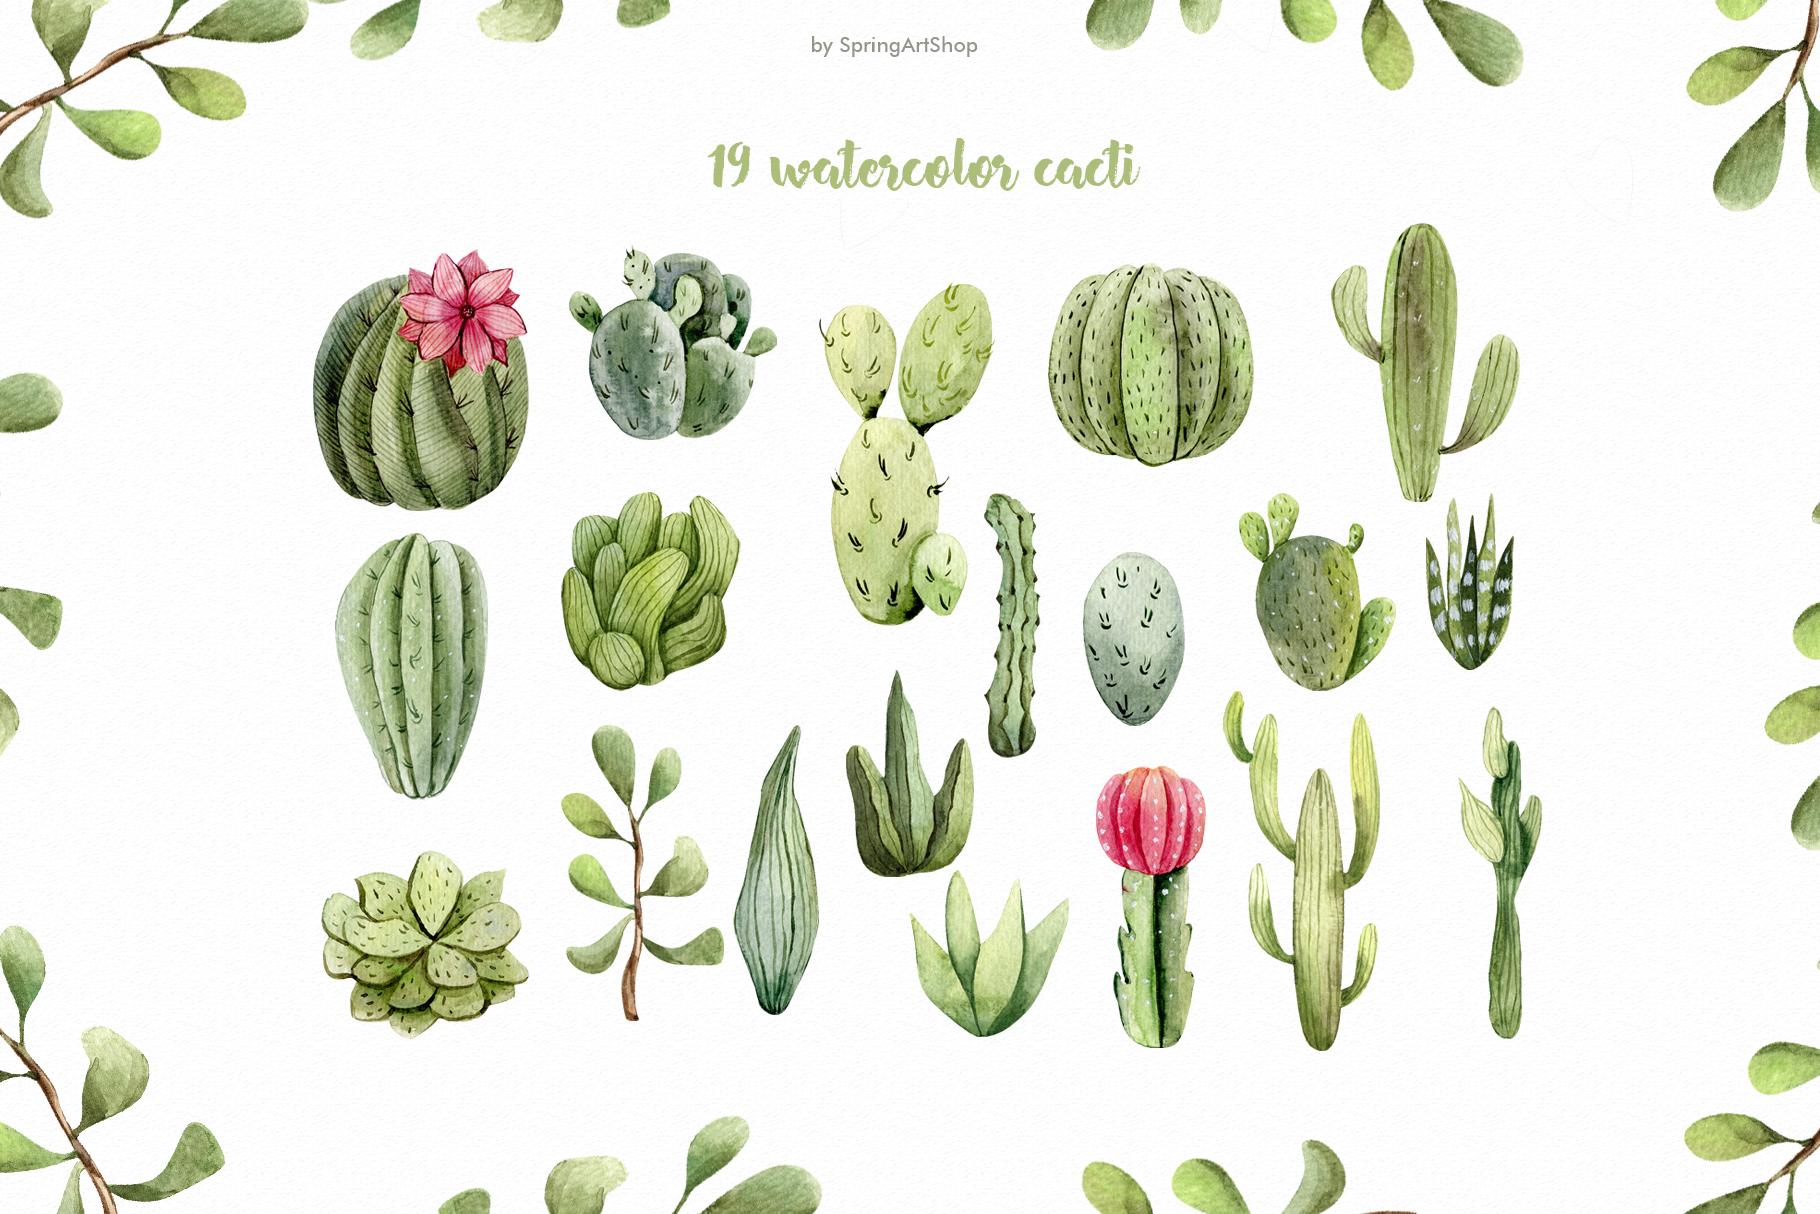 Watercolor Cacti clipart Plants watercolor succulents example image 5